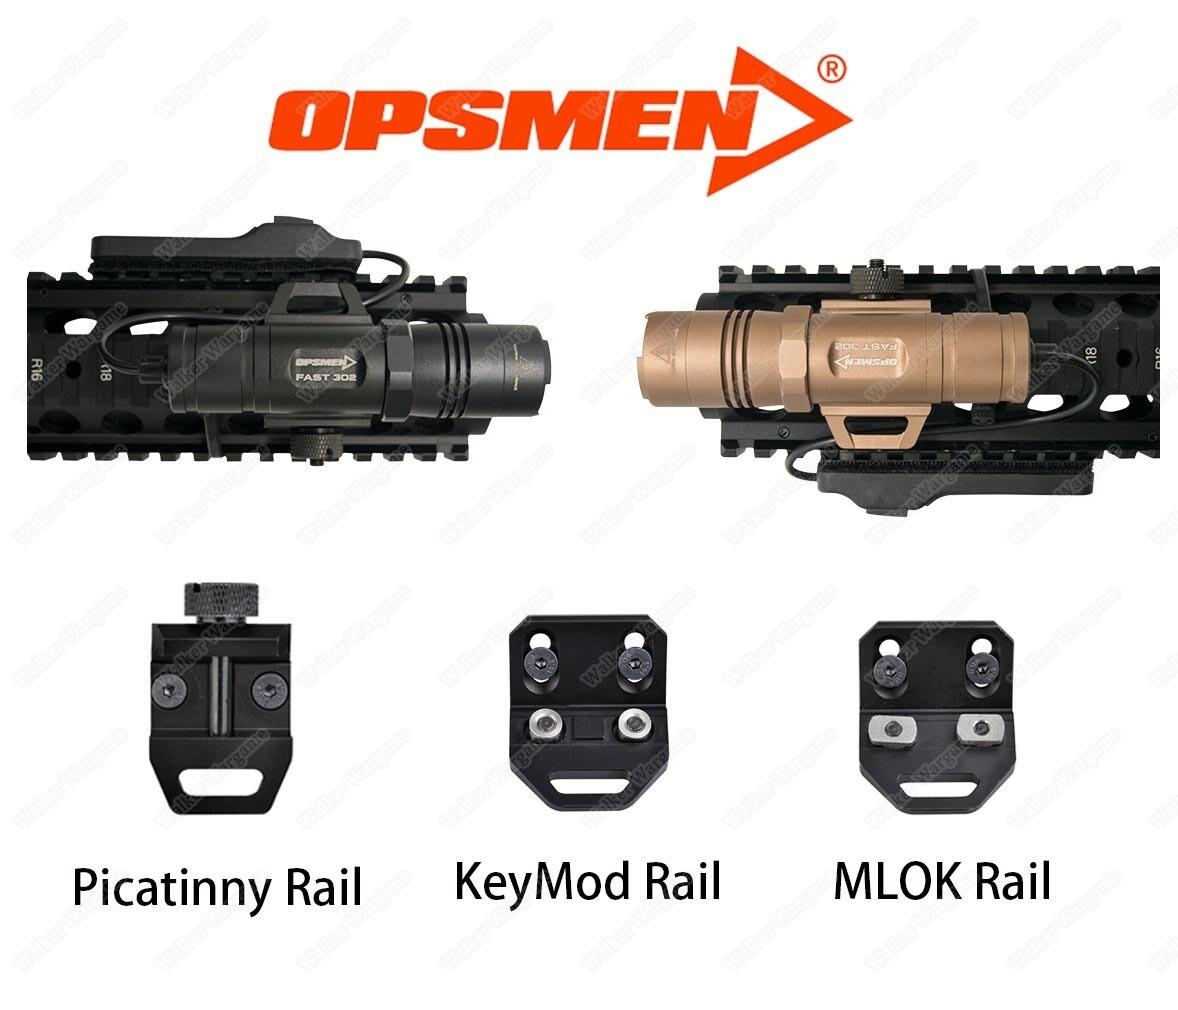 Opsmen FAST 302 Compact  Flashlight 400 Lumens (KeyMod, MLOK, Picatinny Rail)